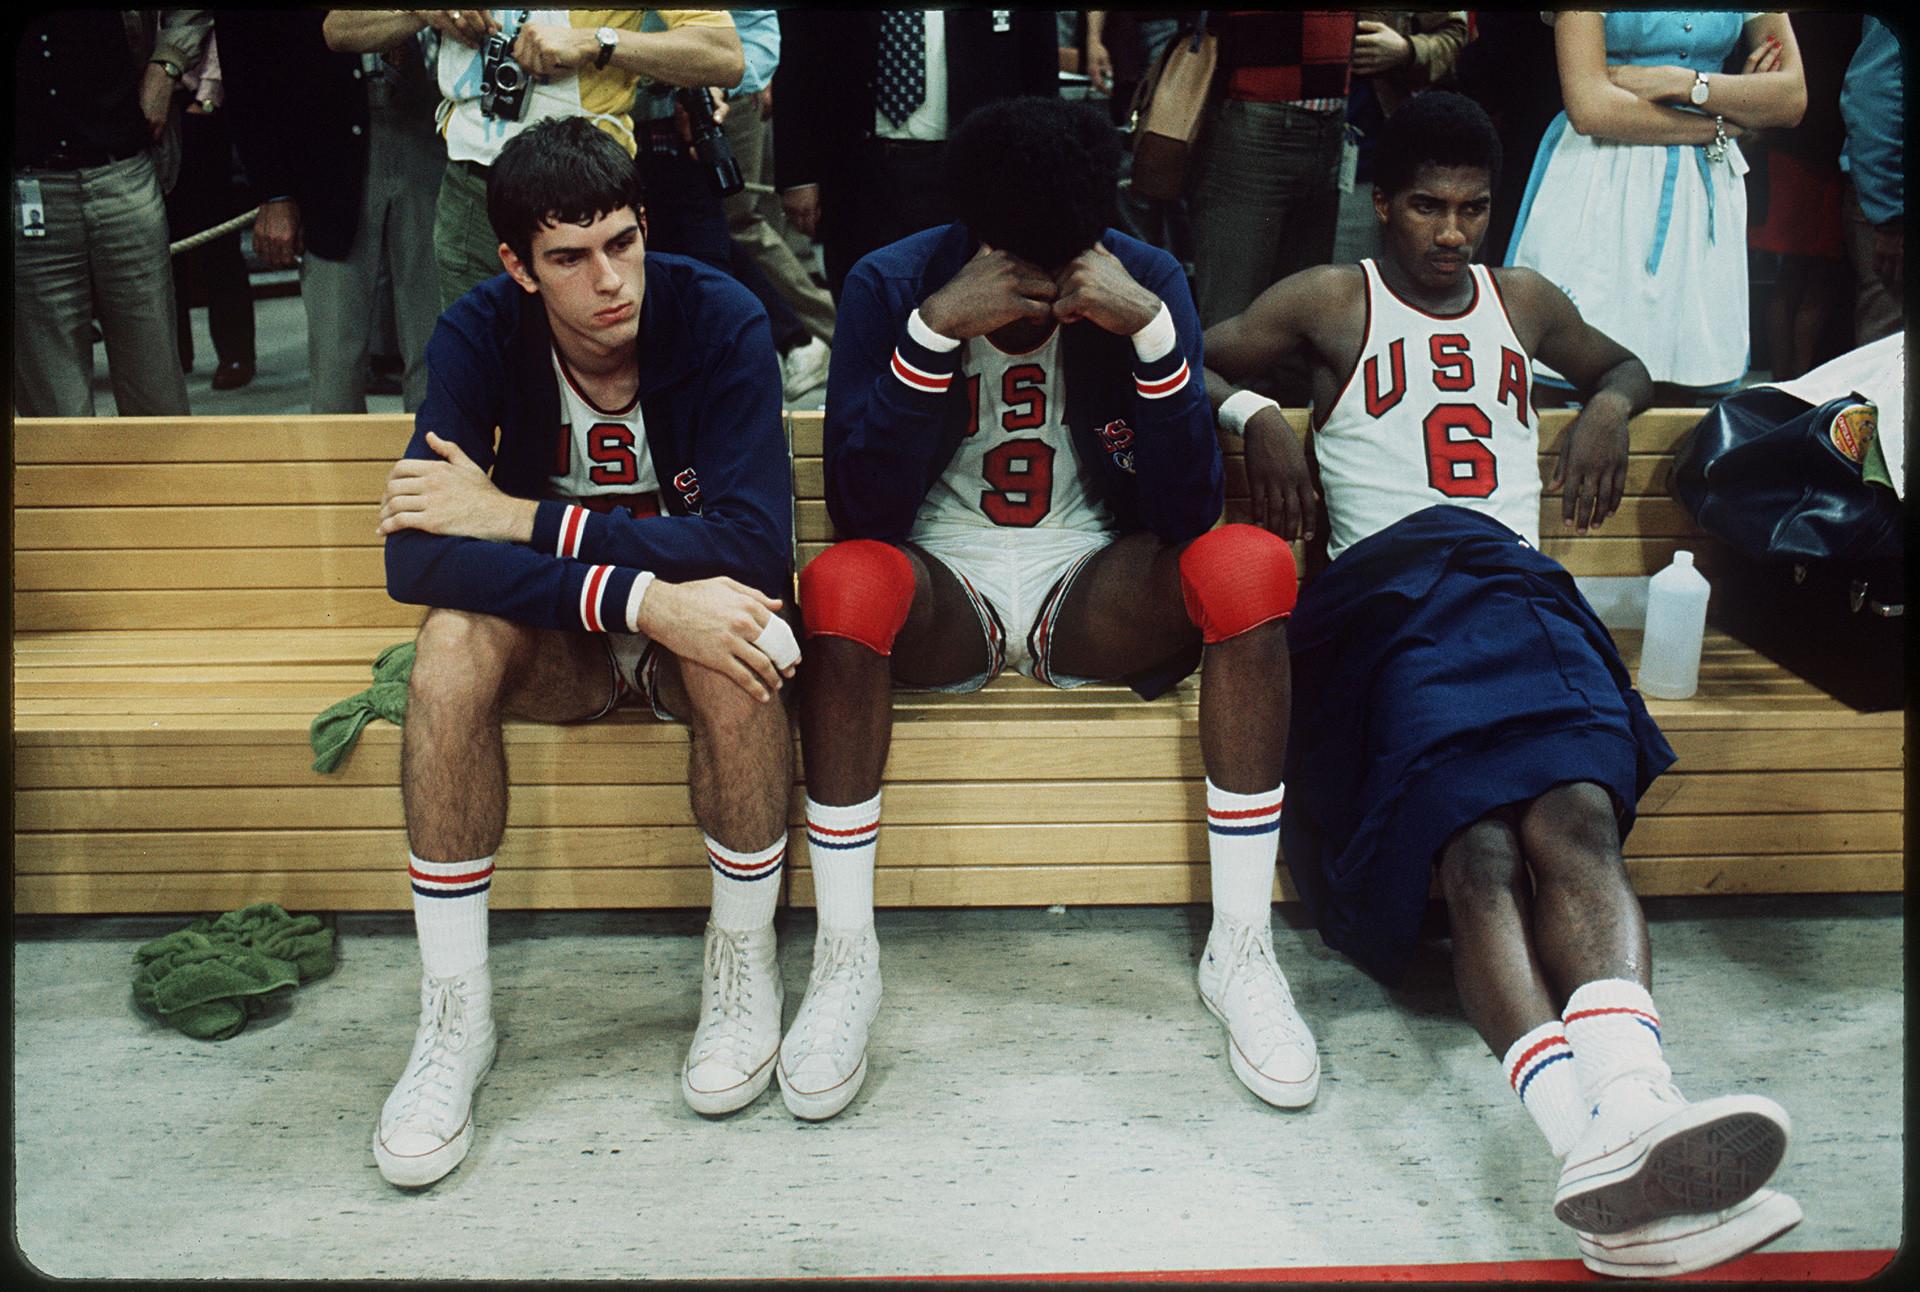 US basketball team